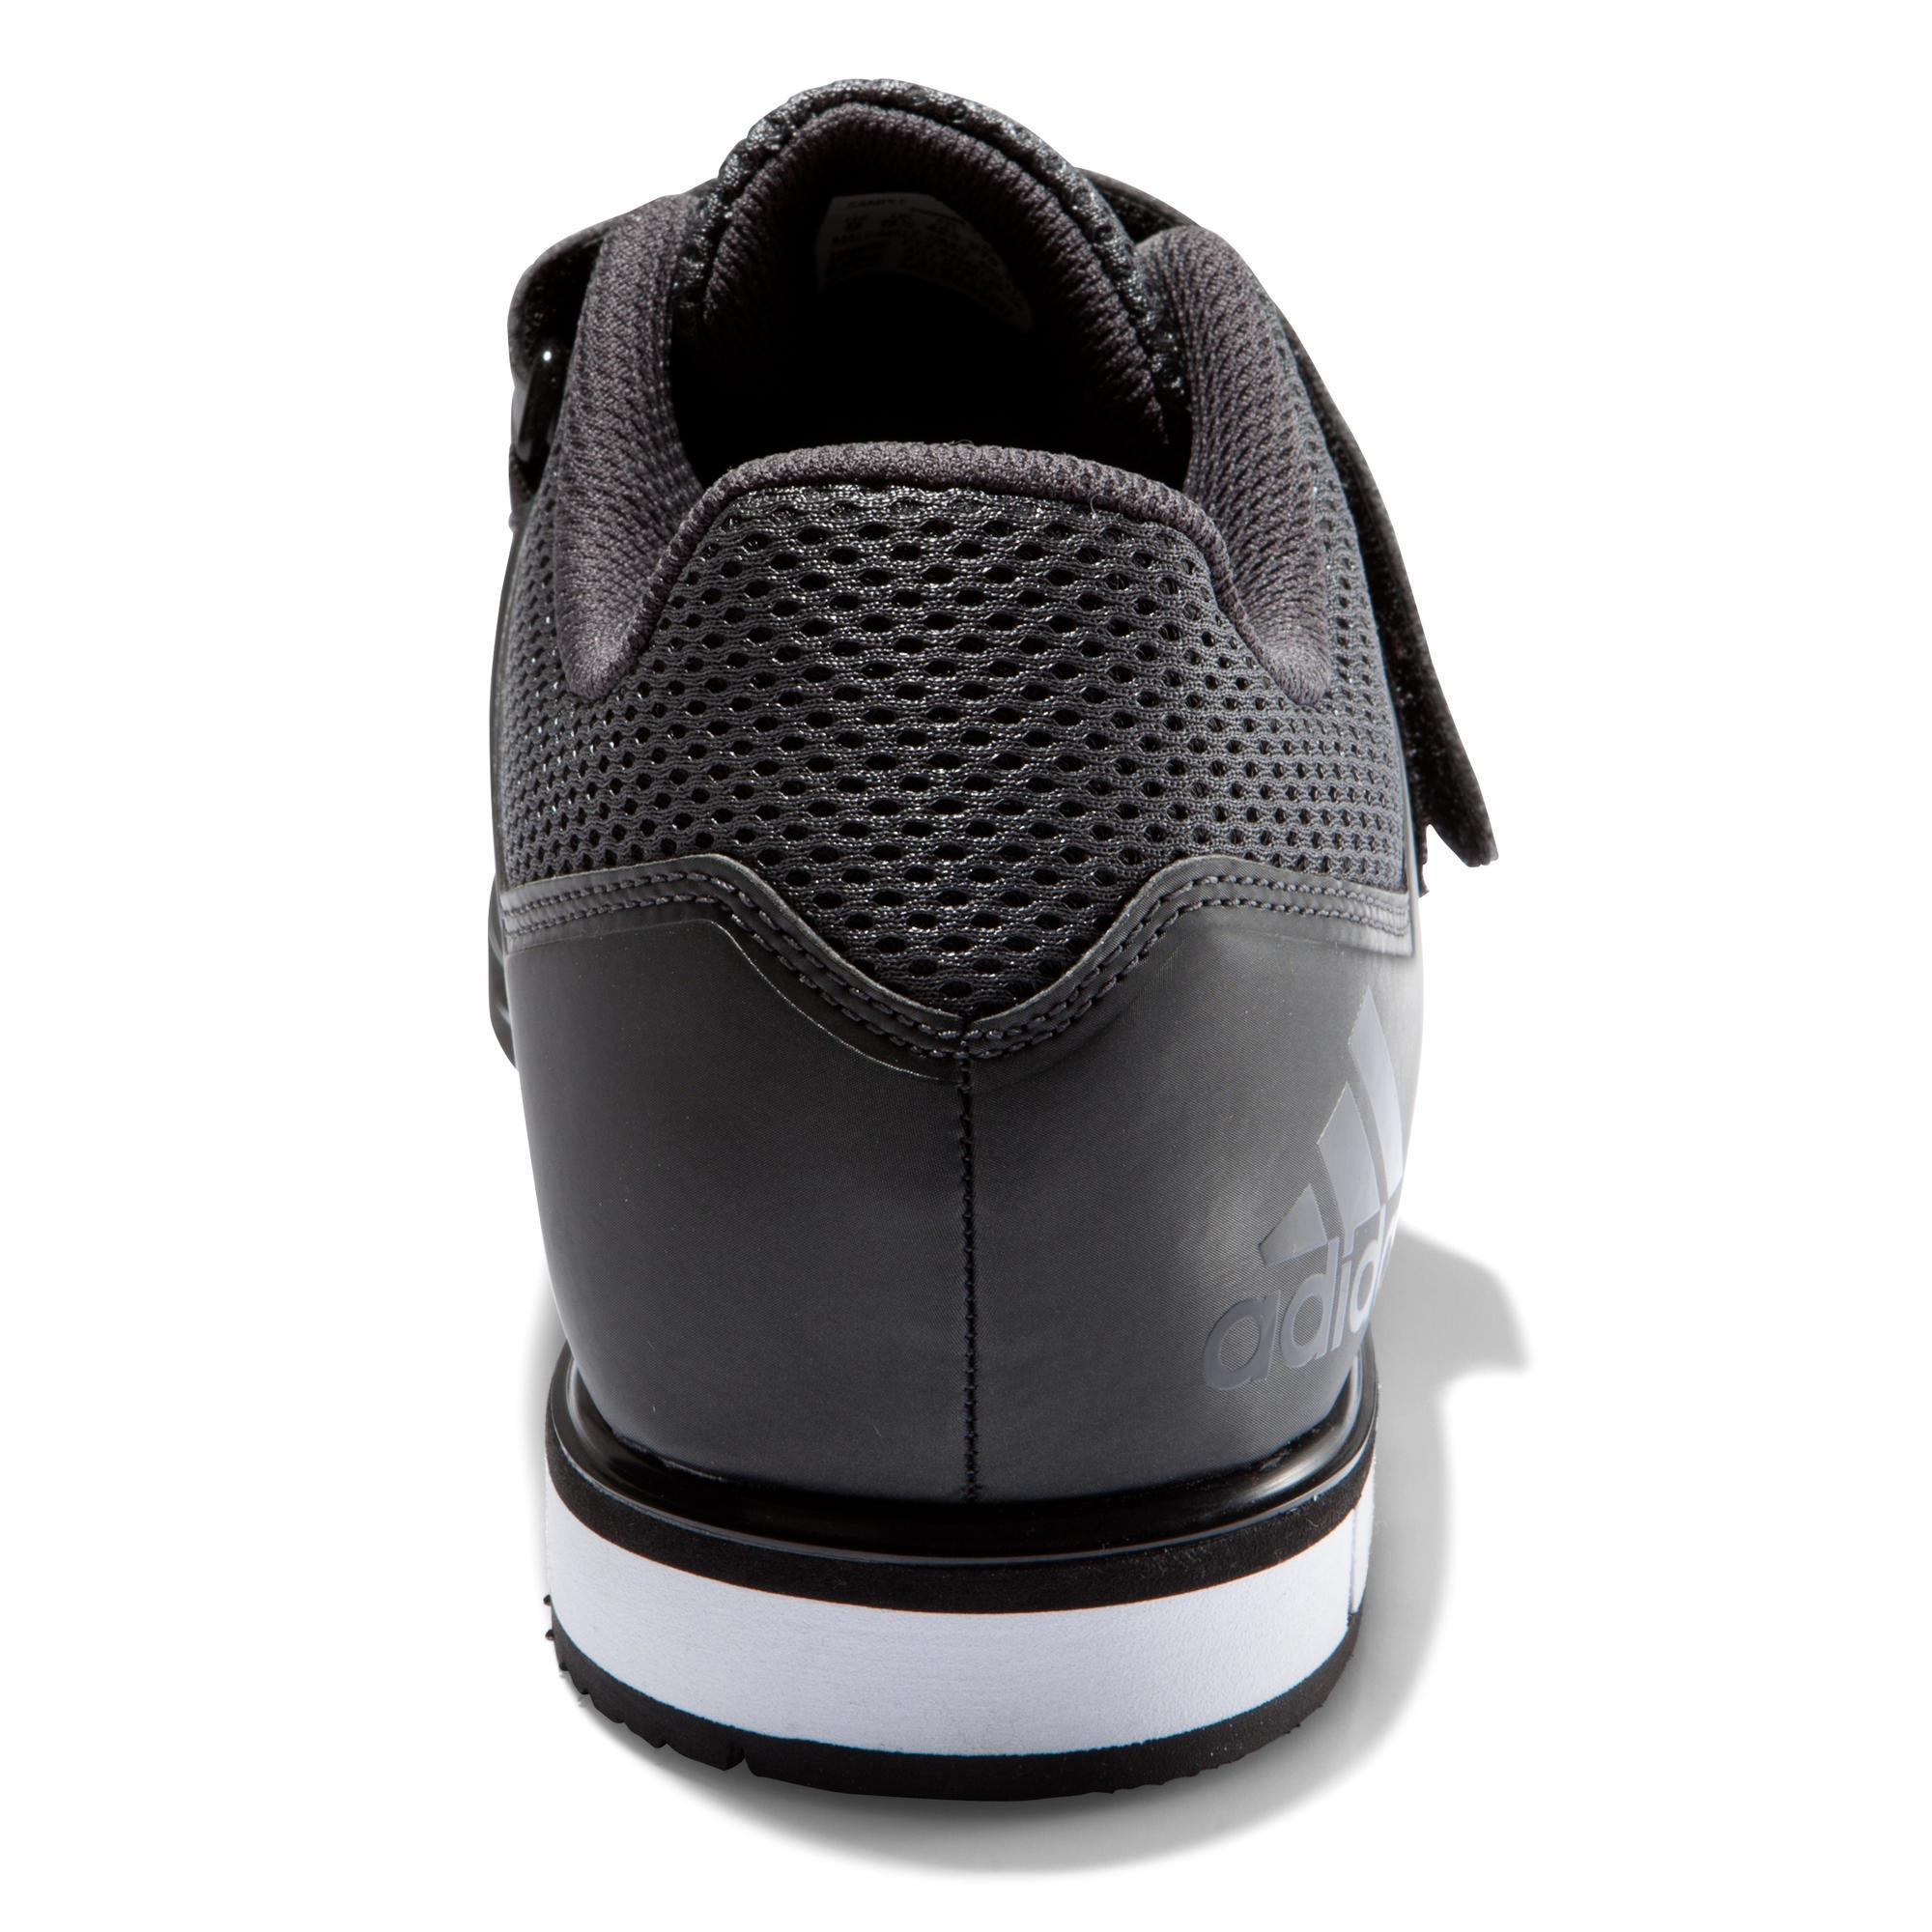 pretty nice 08eeb ad63d Power Haltérophilie Lift Chaussure Decathlon Adidas 1 3 8EwqWU